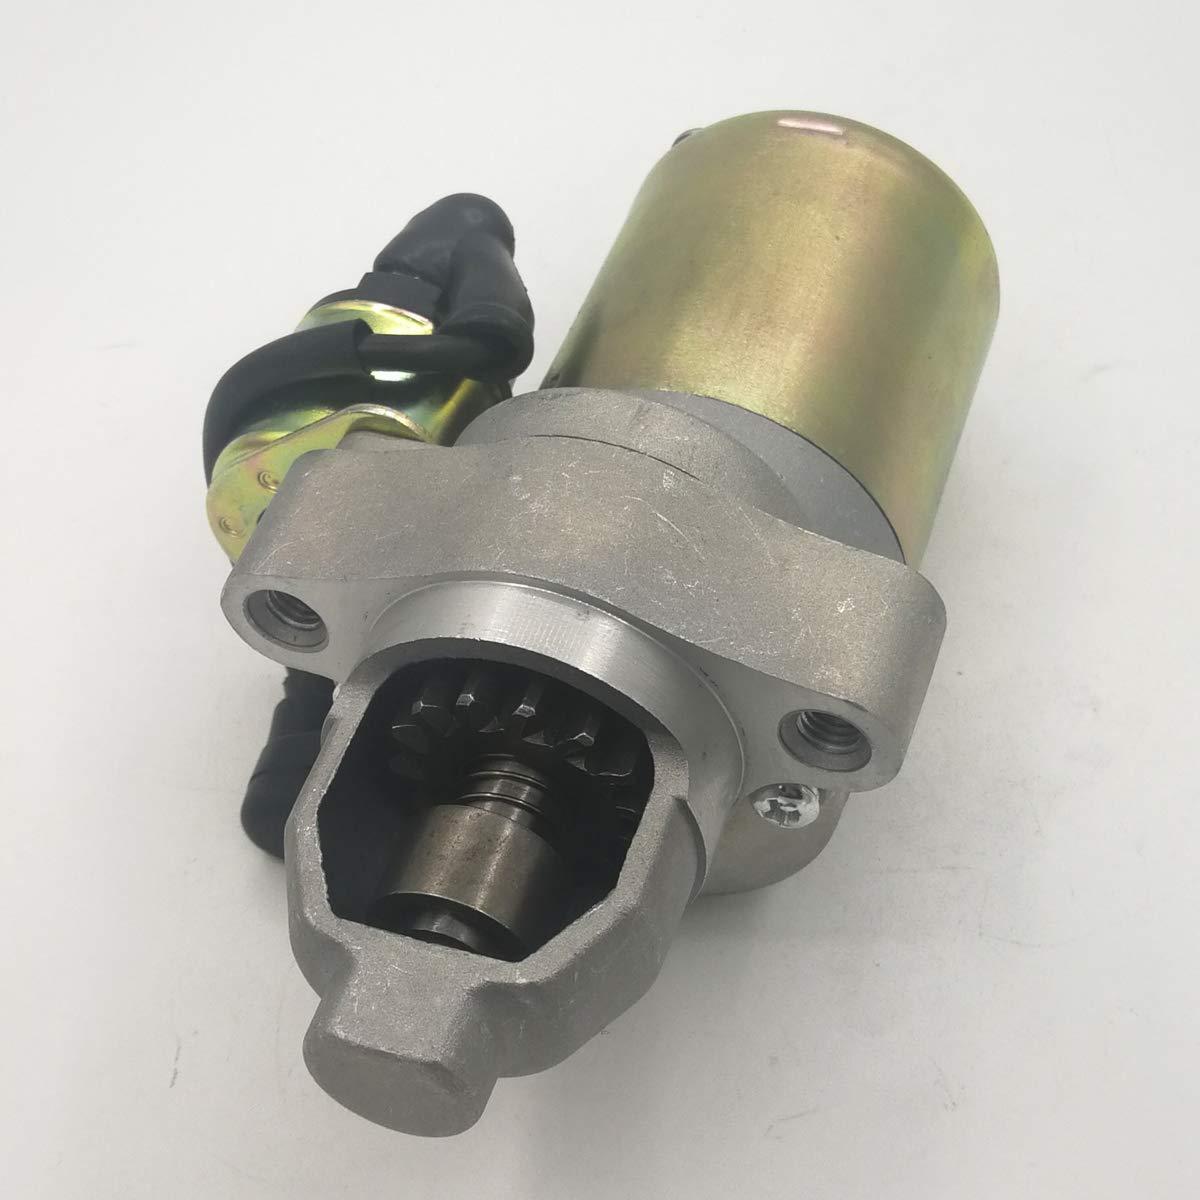 Cancanle Starter Motor for Honda GX270 GX240 8.5HP 7.9HP Engine 31200-ZH9-013